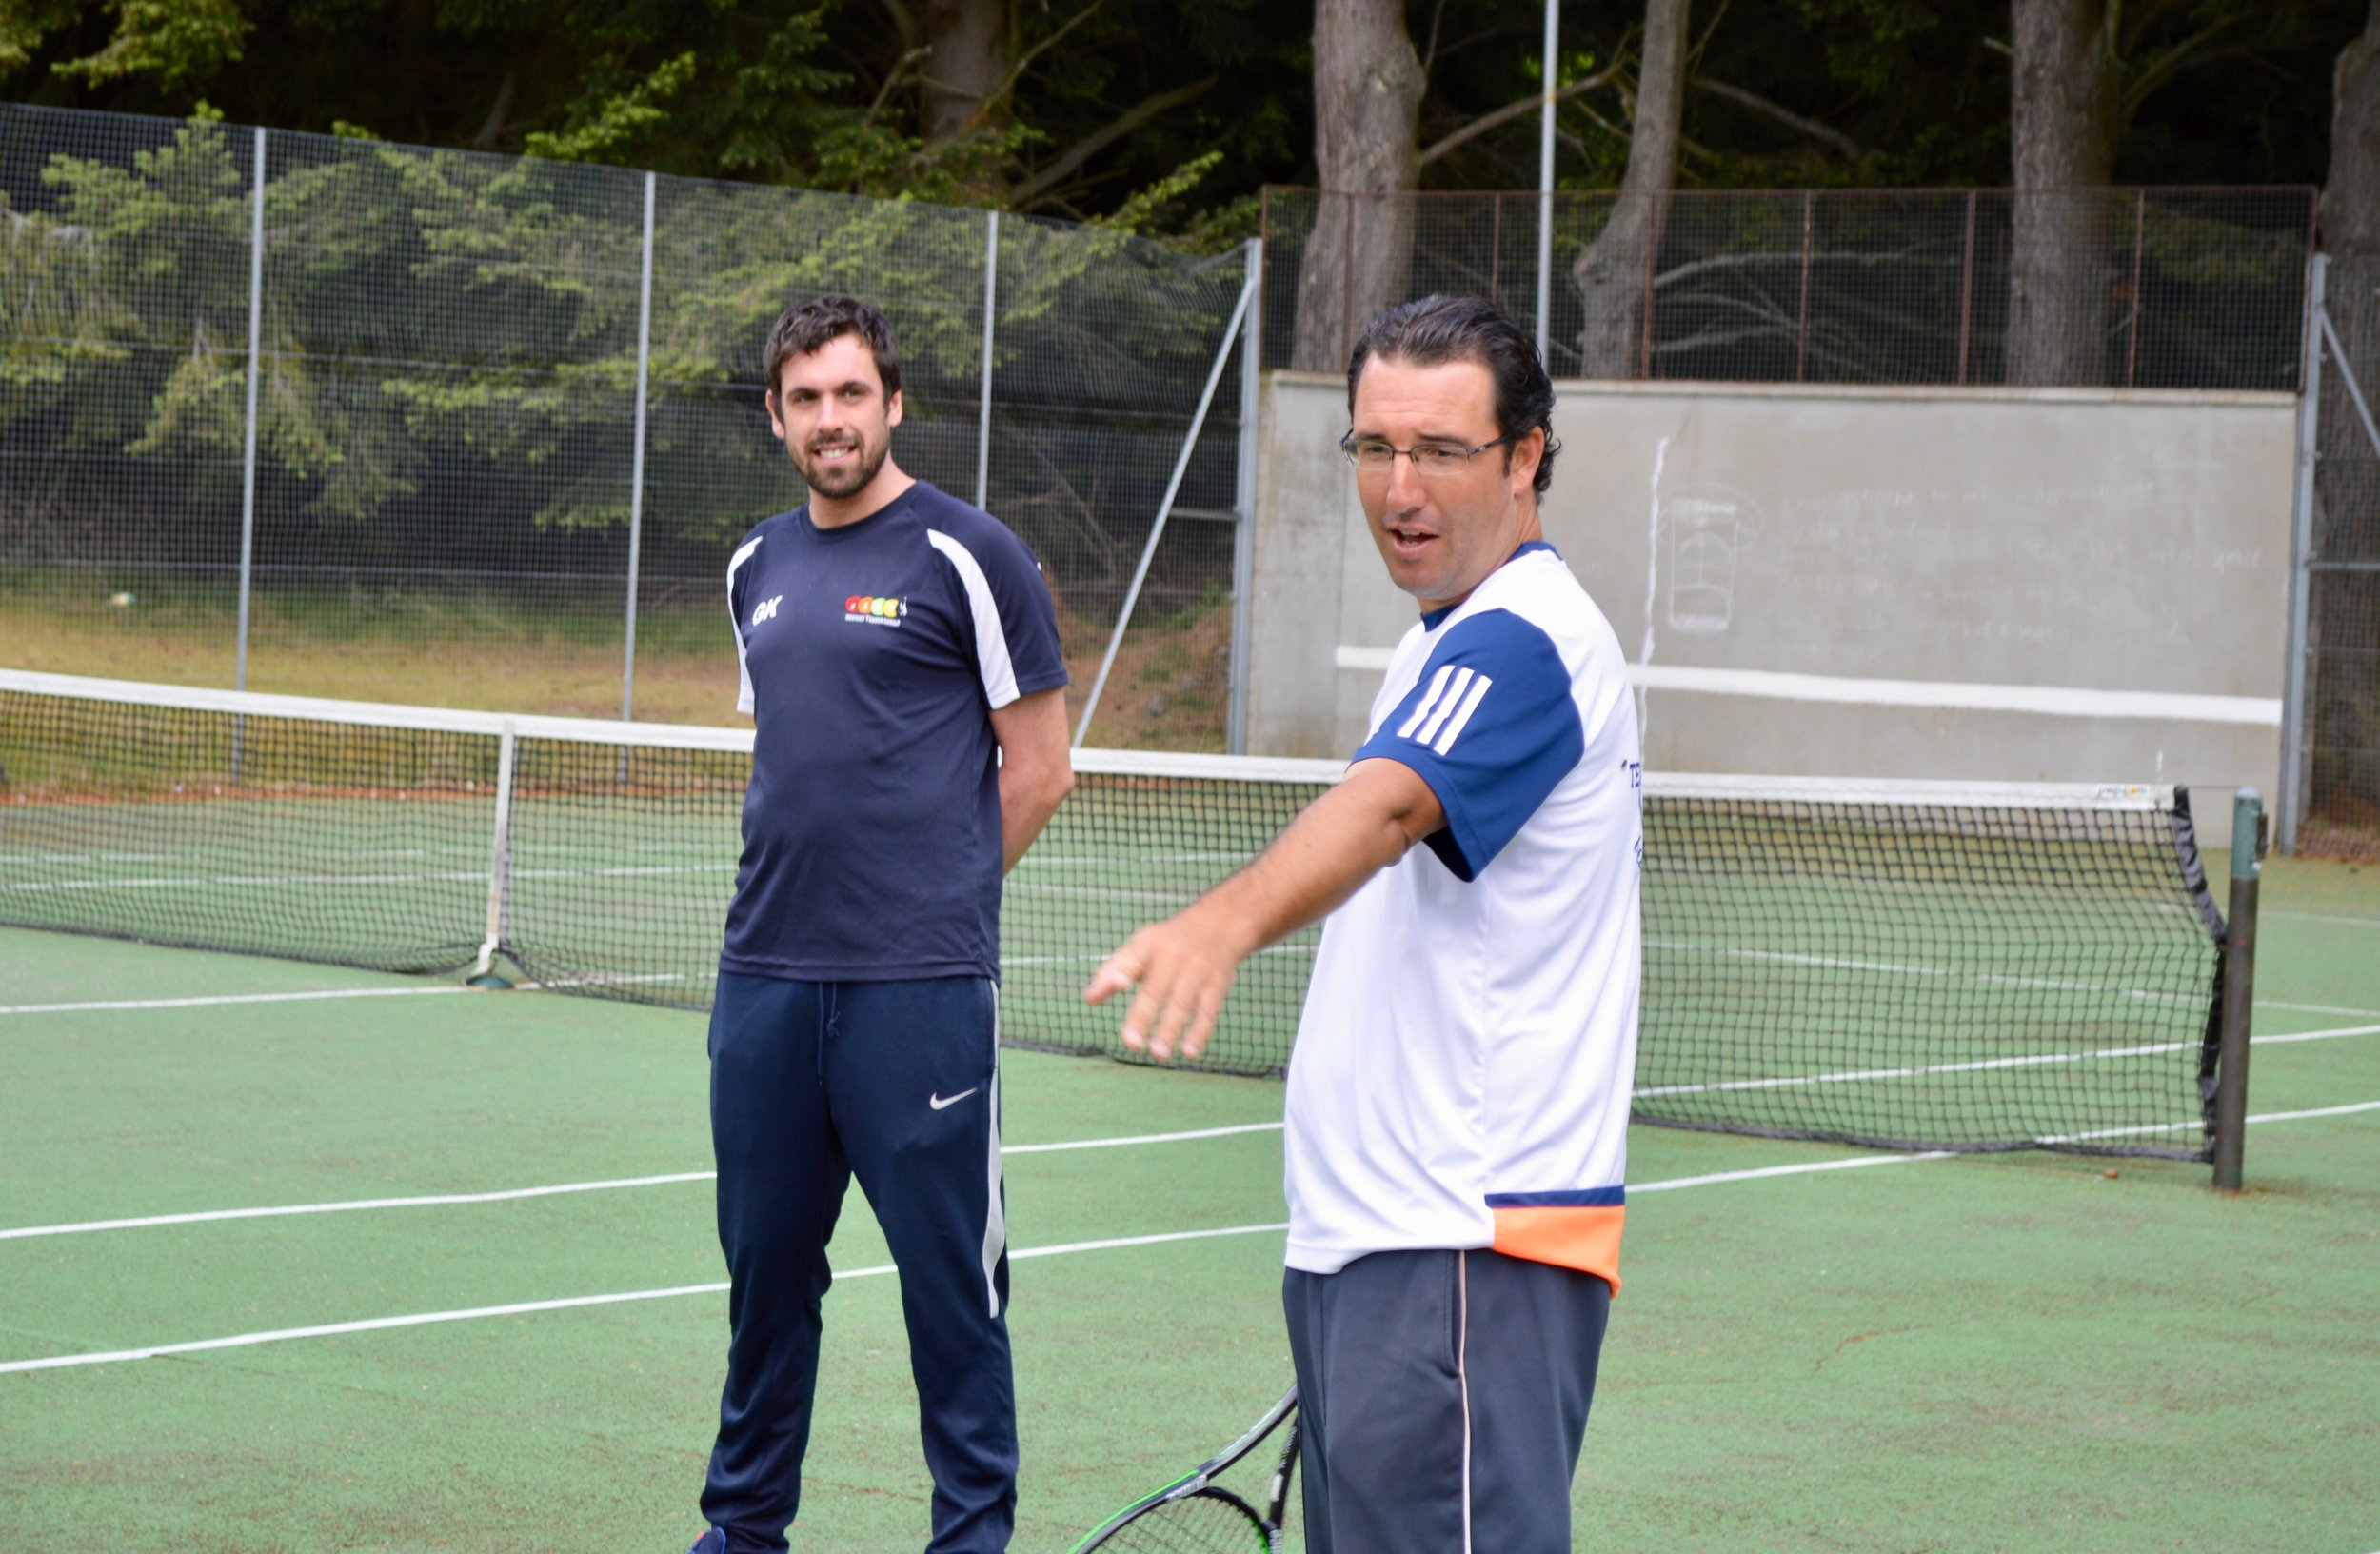 barcelona-tennis-academy-in-scotland